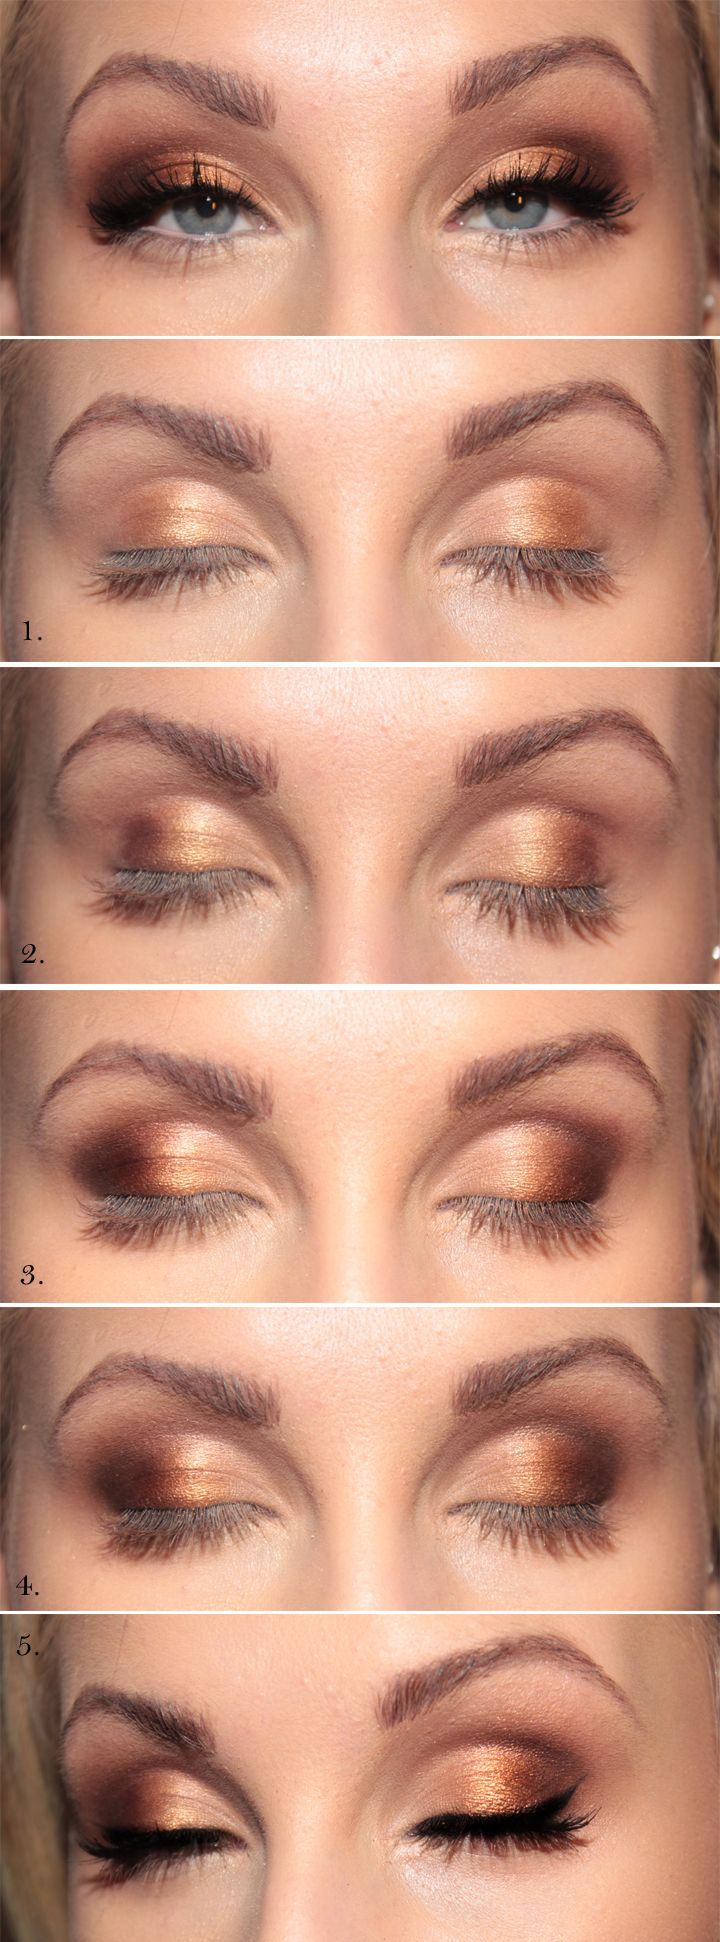 13 Charming Golden Eye Makeup Looks for 2017